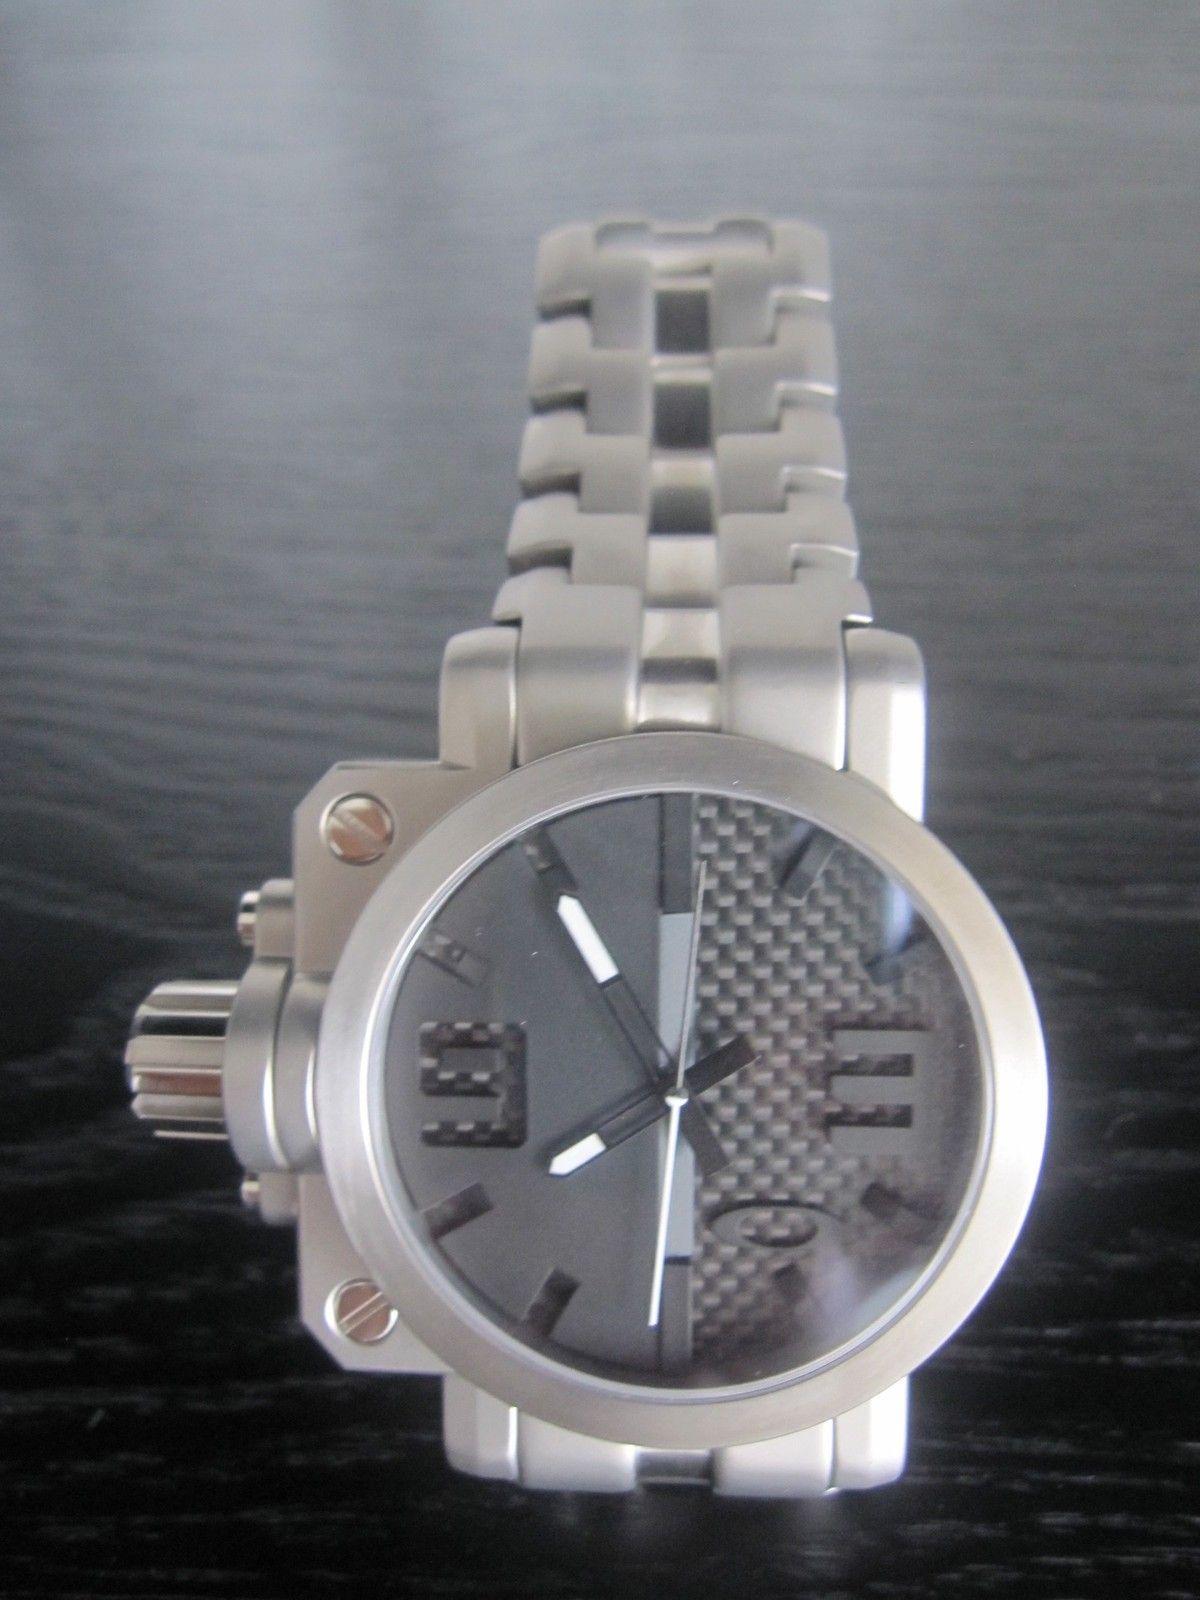 BNIB Gearbox Titanium Bracelet Watch - OW0004-01 - IMG_2056.JPG